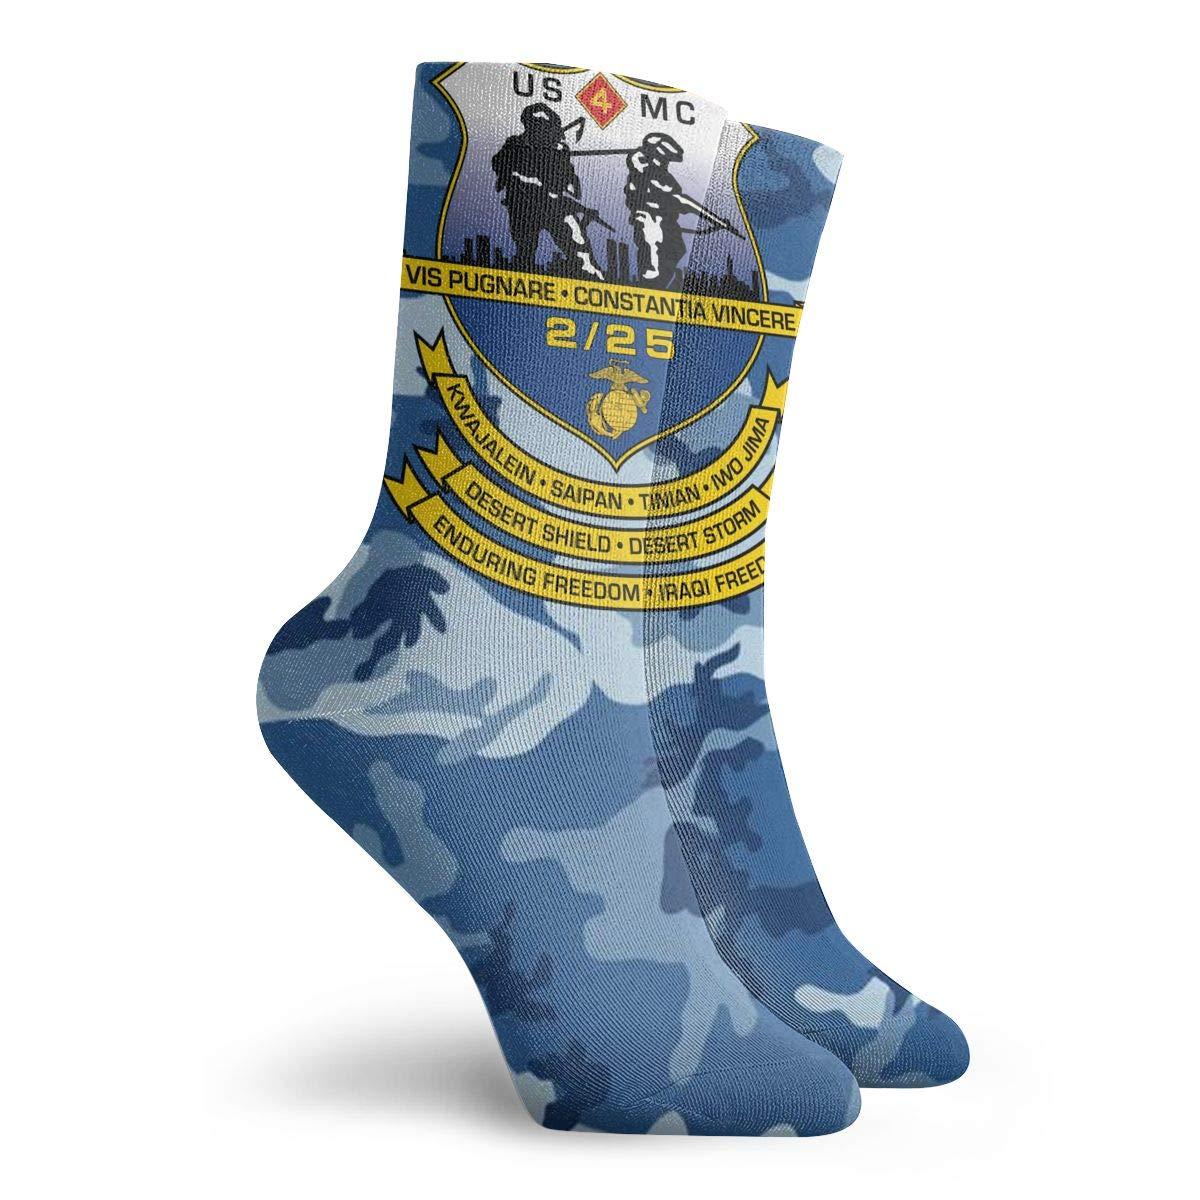 2nd Battalion 25th Marines Unisex Athletic Socks 30cm Long Sock